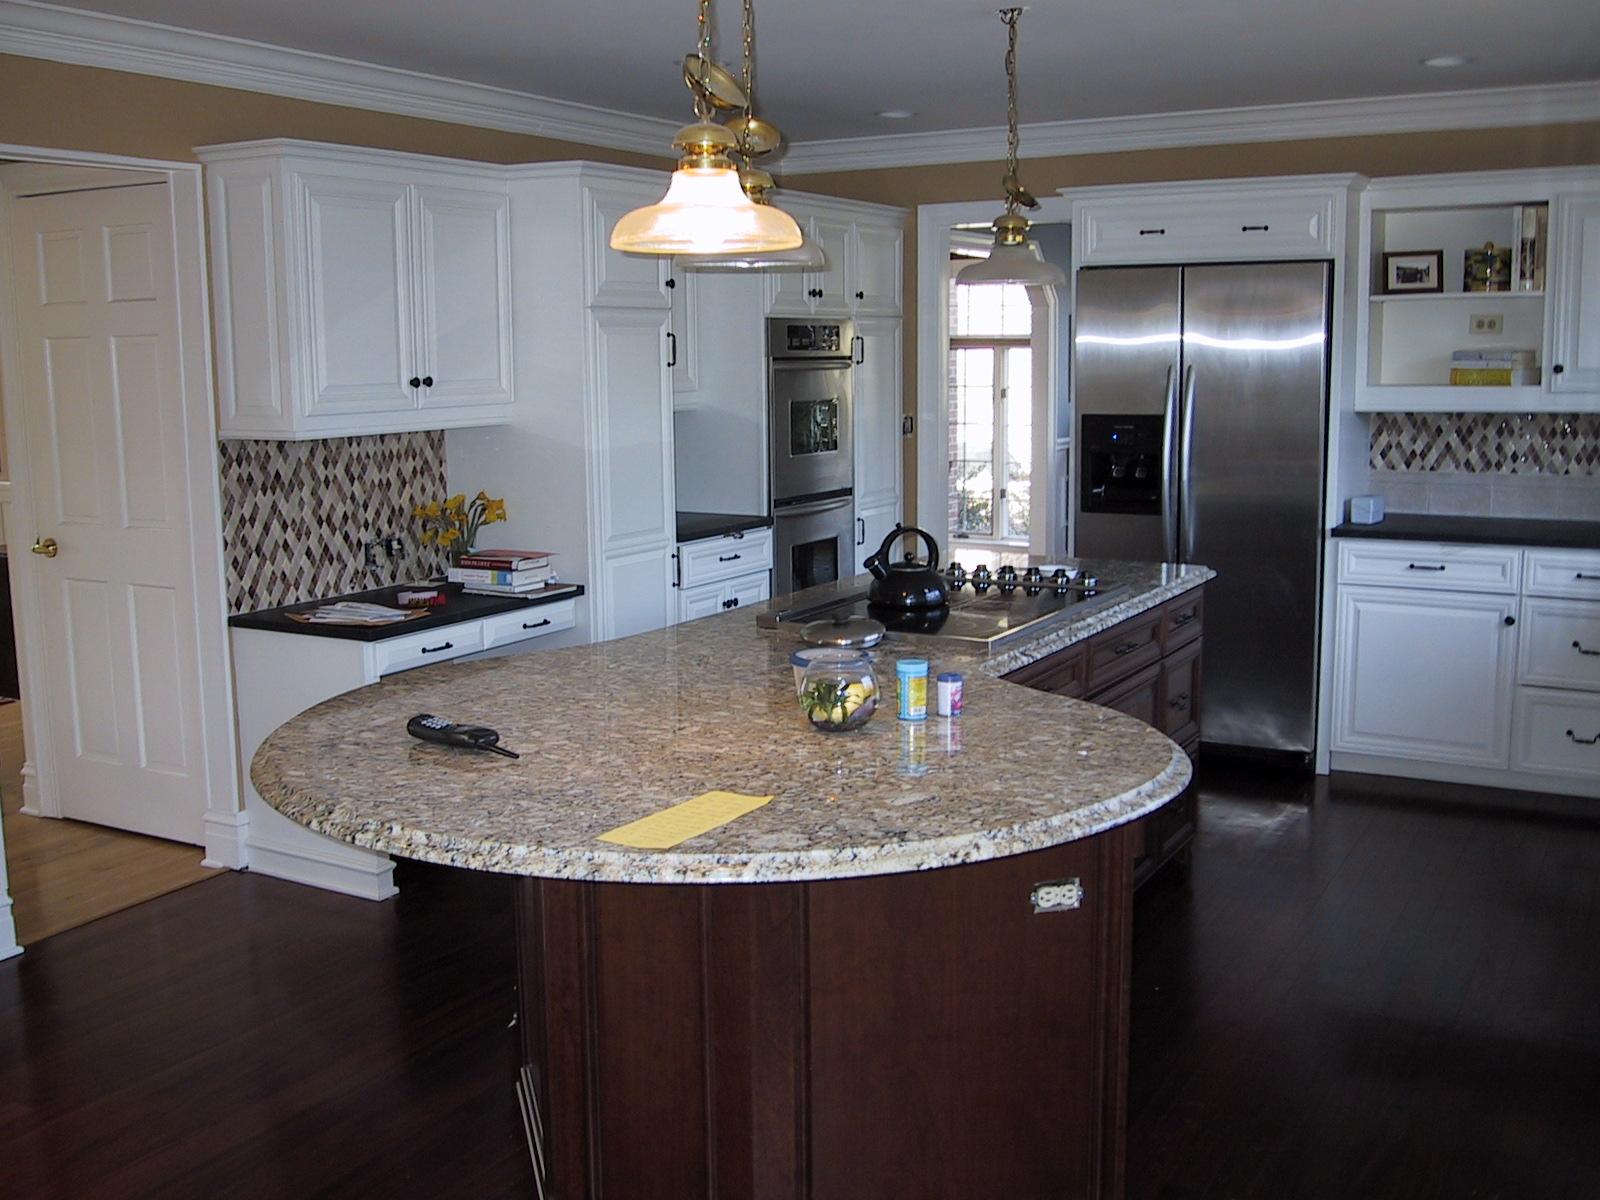 Cabinet Refacing Cost Kitchen Craftsman Geneva Illinois